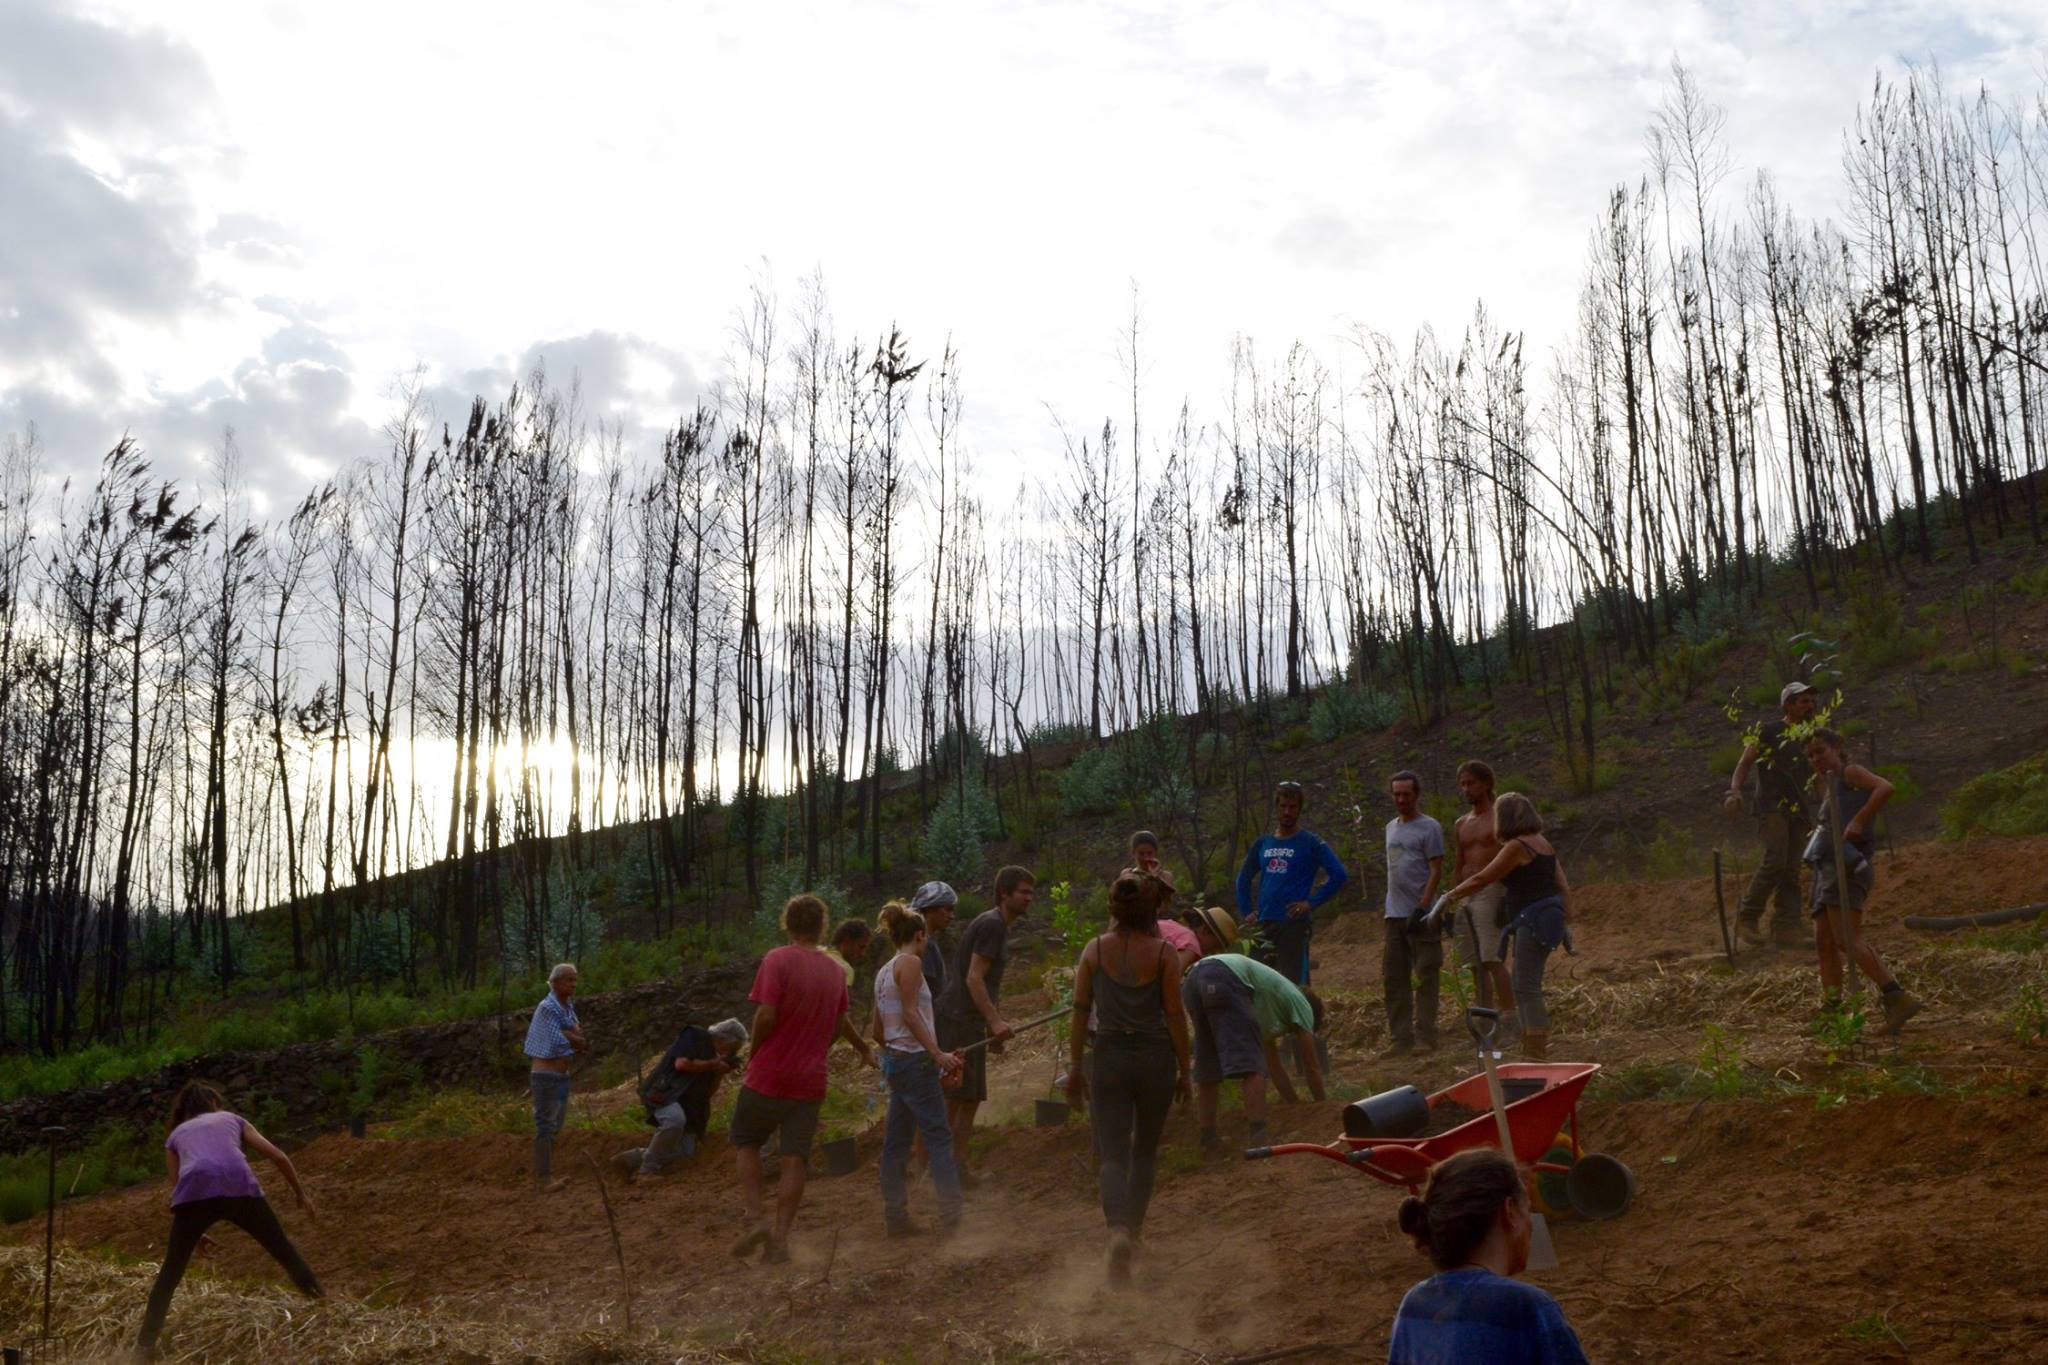 planting trees with volunteers.